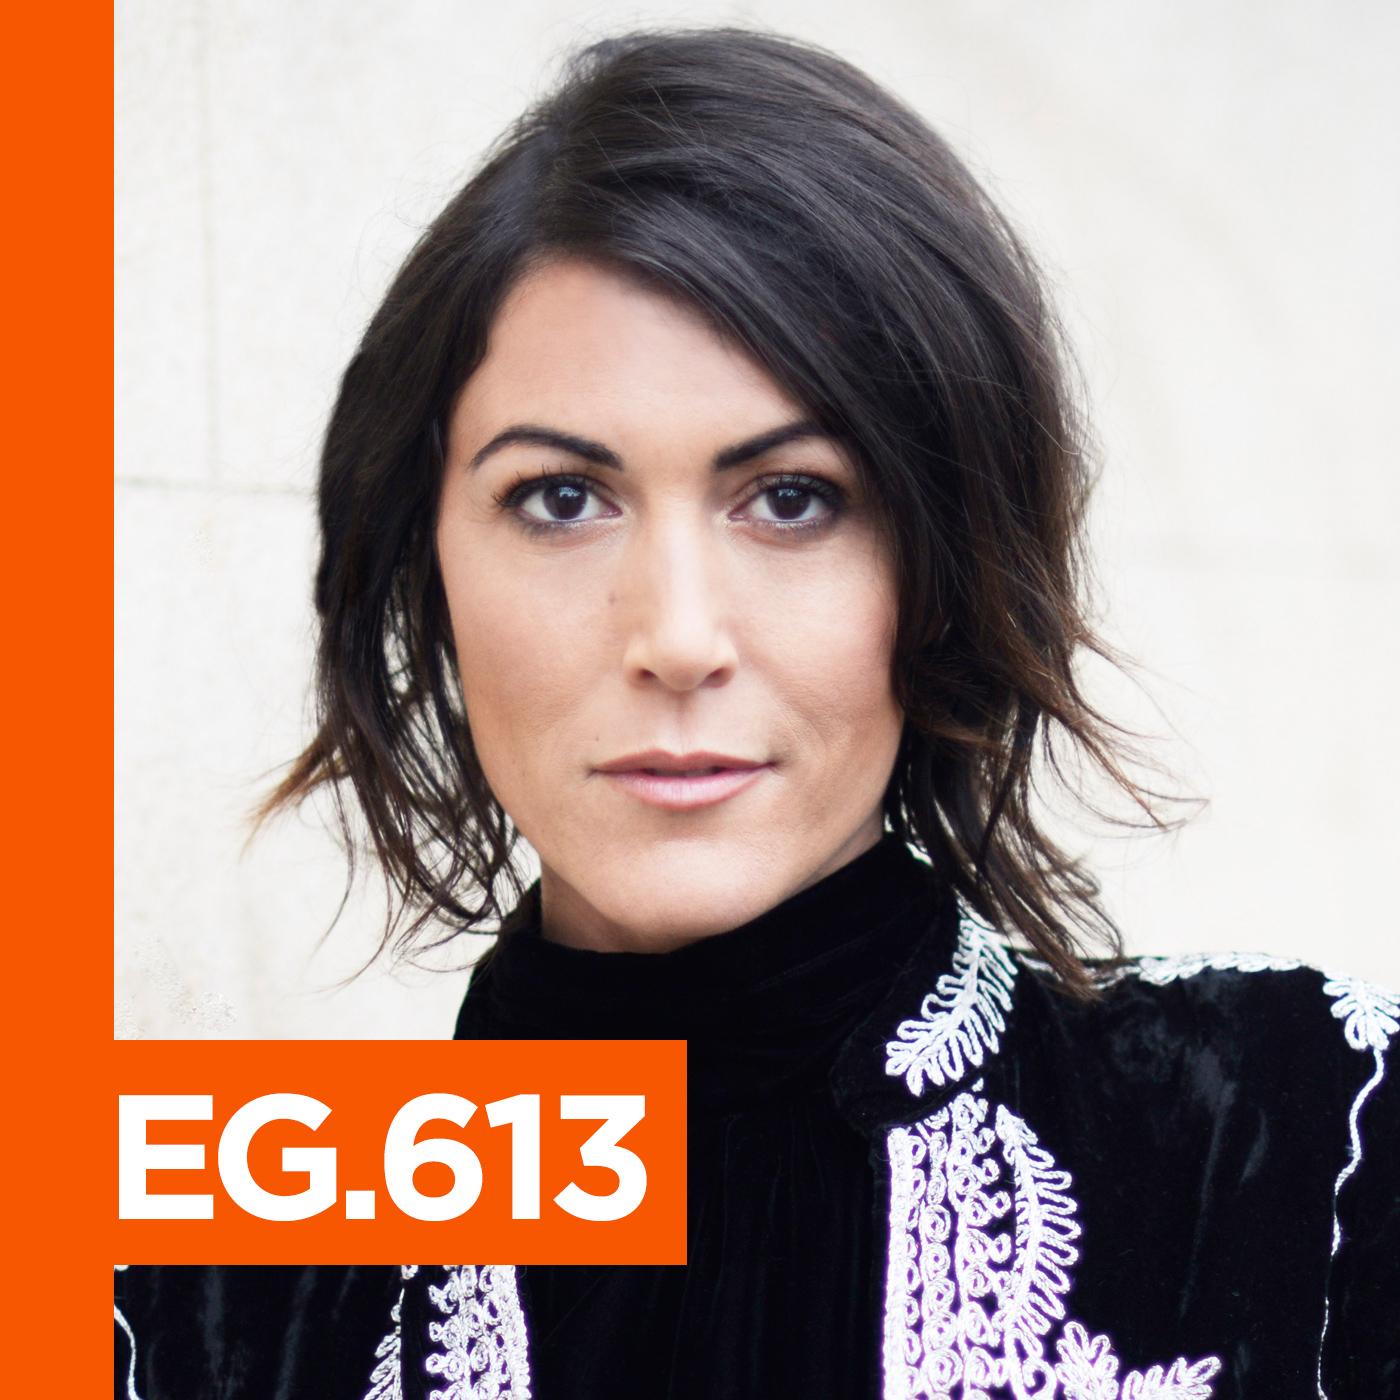 EG.613 Francesca Lombardo